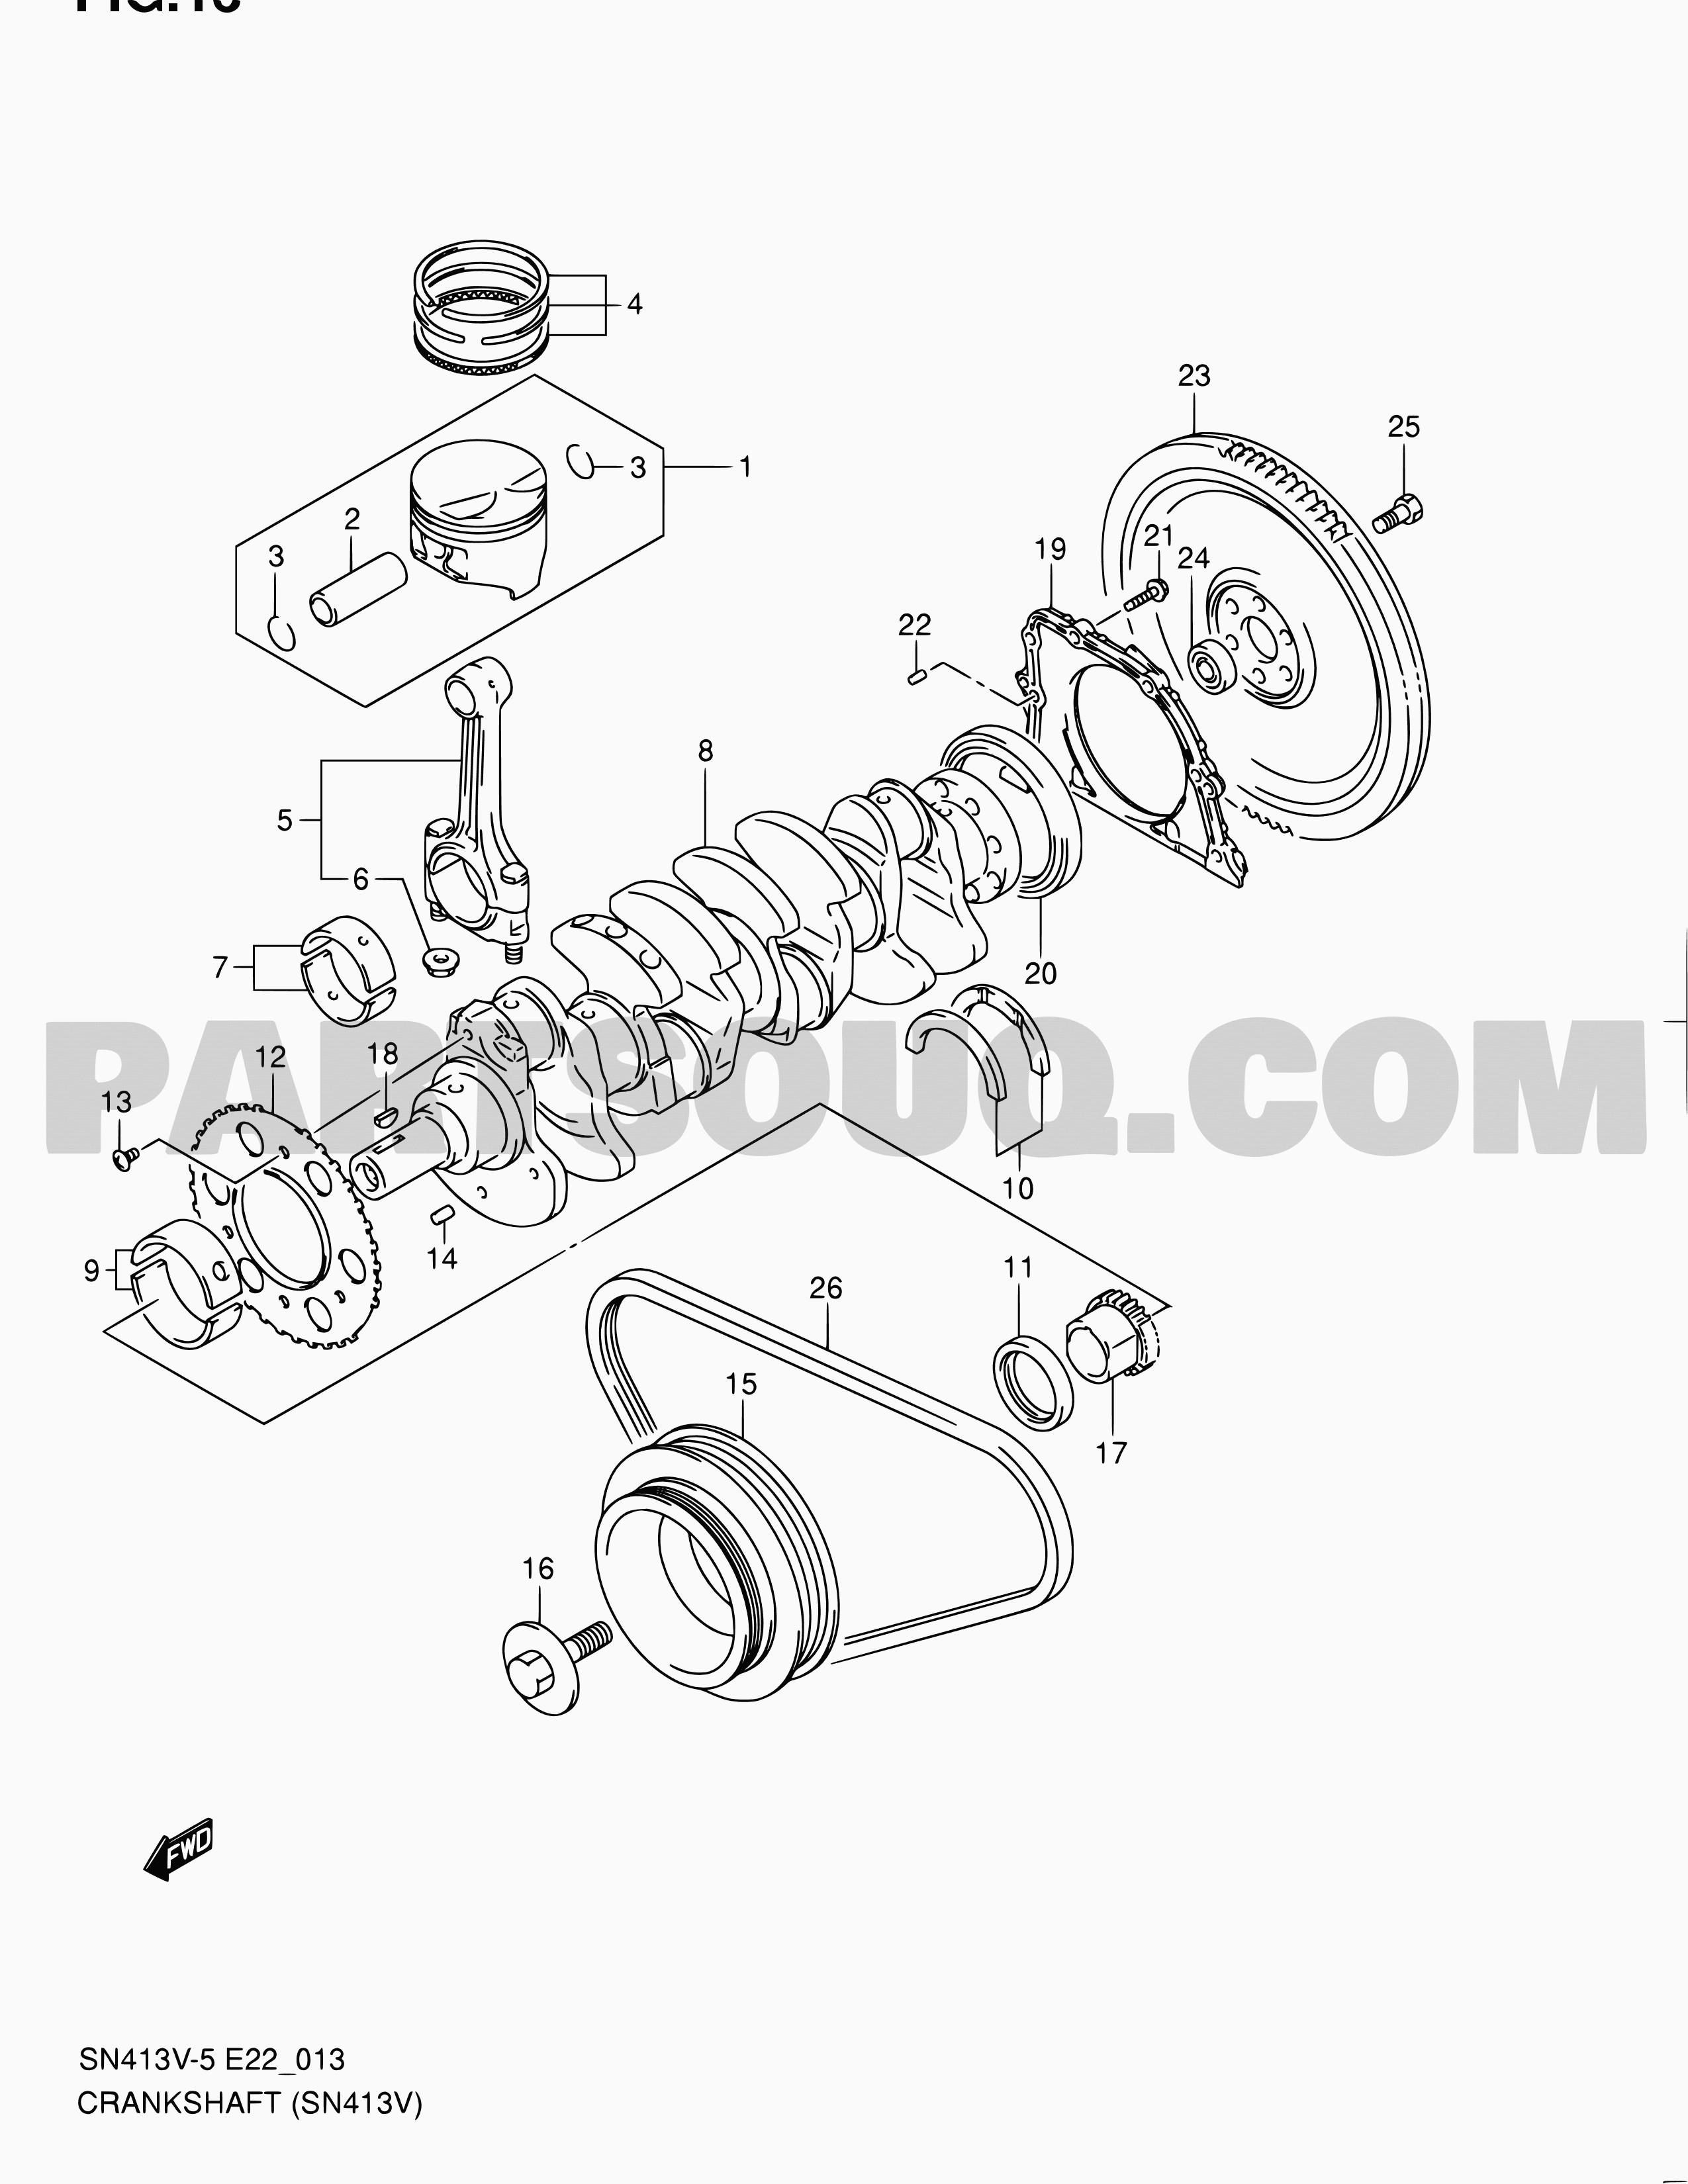 Suzuki m13a engine diagram jimny z2t m13a jsafjb43v suzuki my rh detoxicrecenze motorcycle wiring harness diagram 1994 suzuki schematics